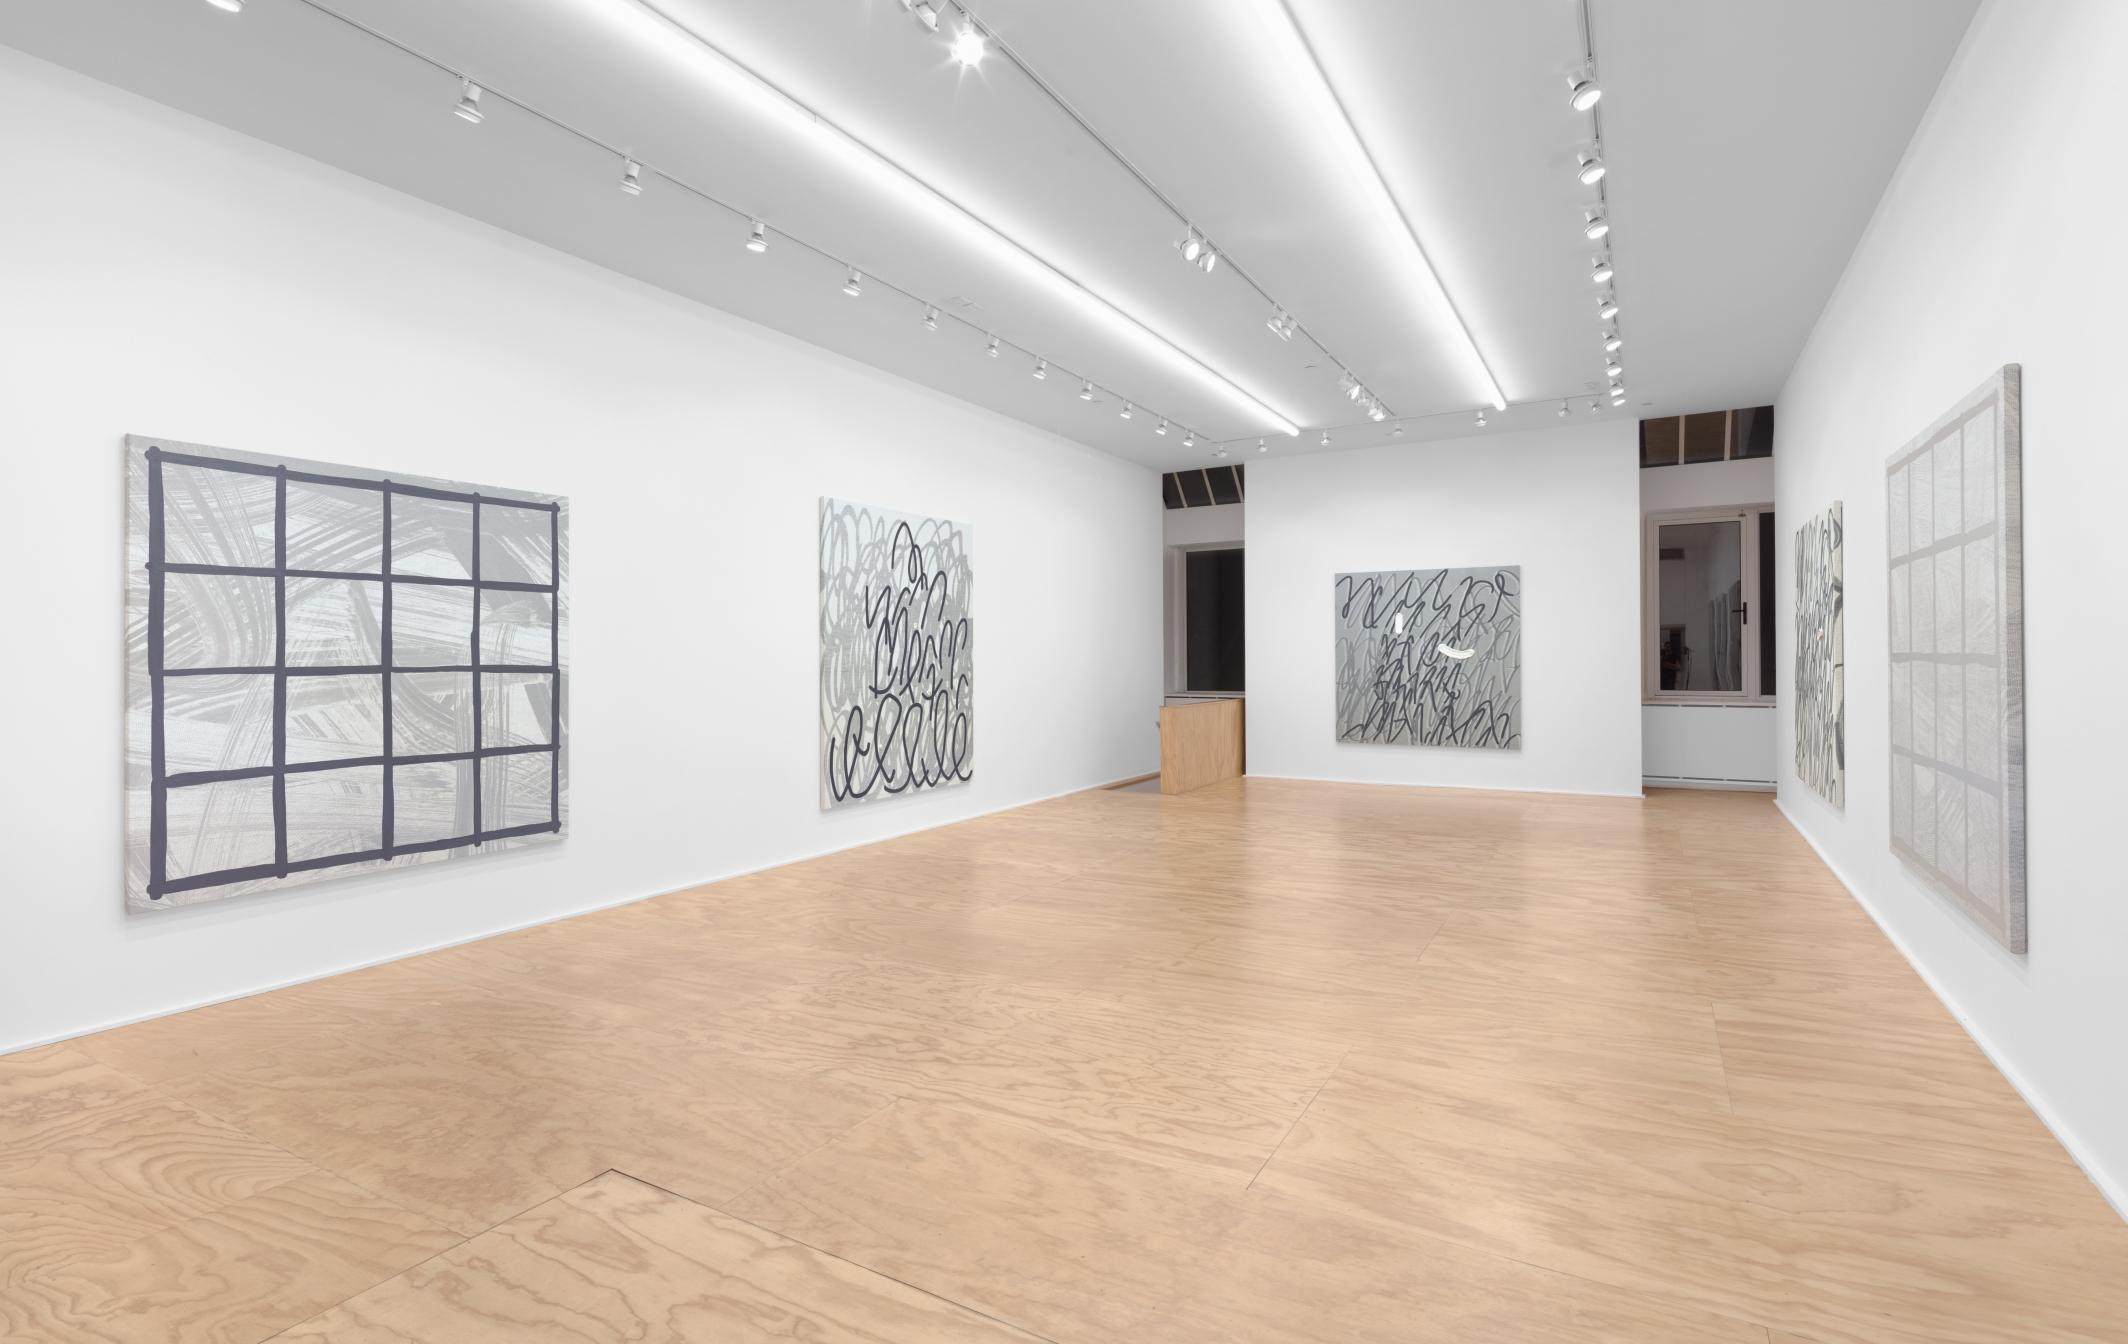 Installation view of Amy Feldman paintings